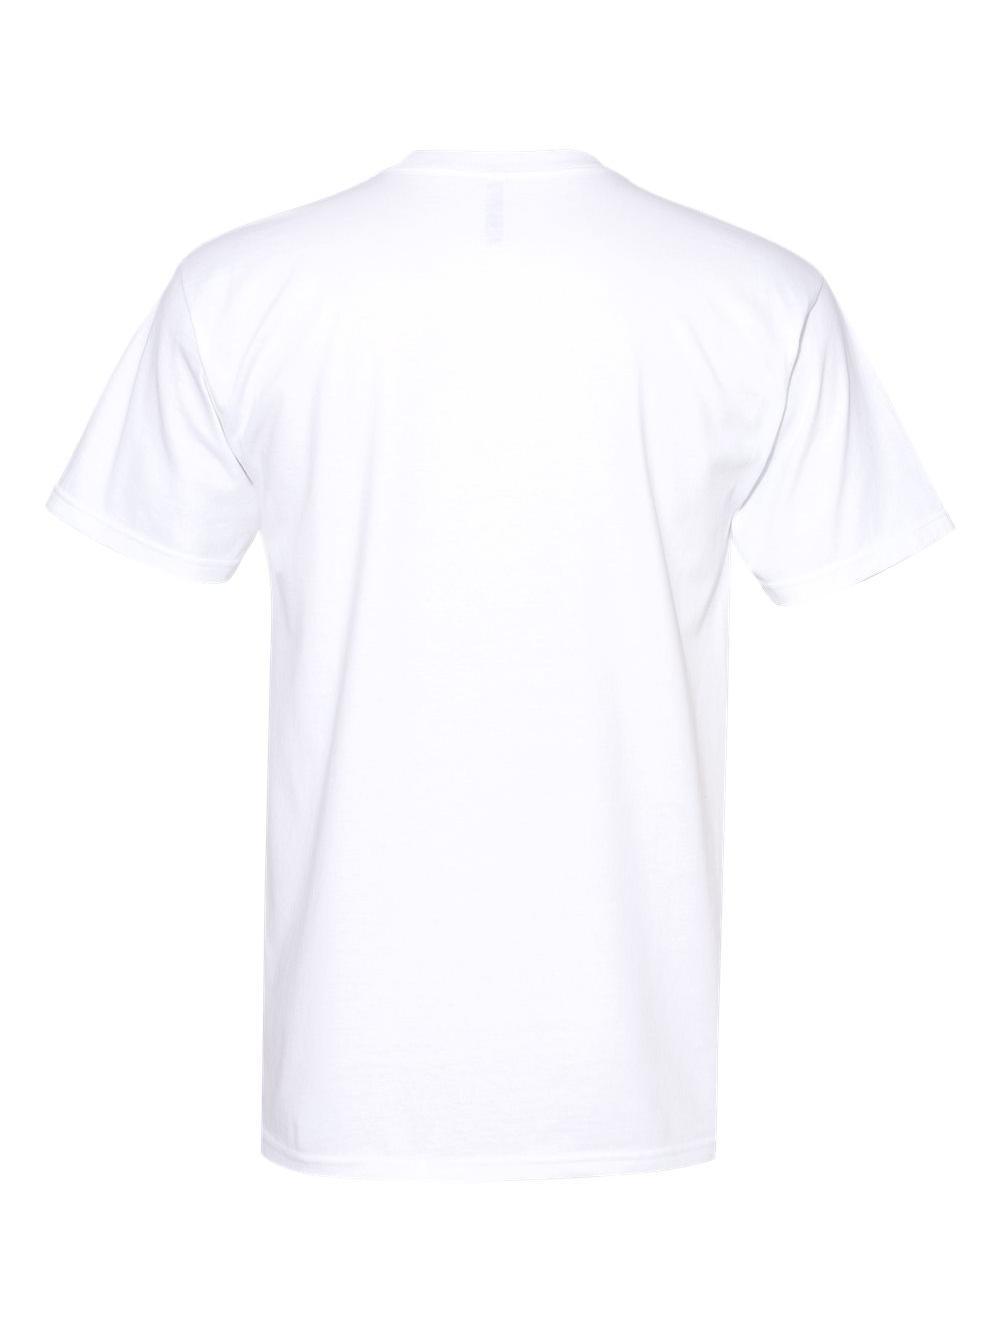 ALSTYLE-Premium-T-Shirt-1701 thumbnail 71